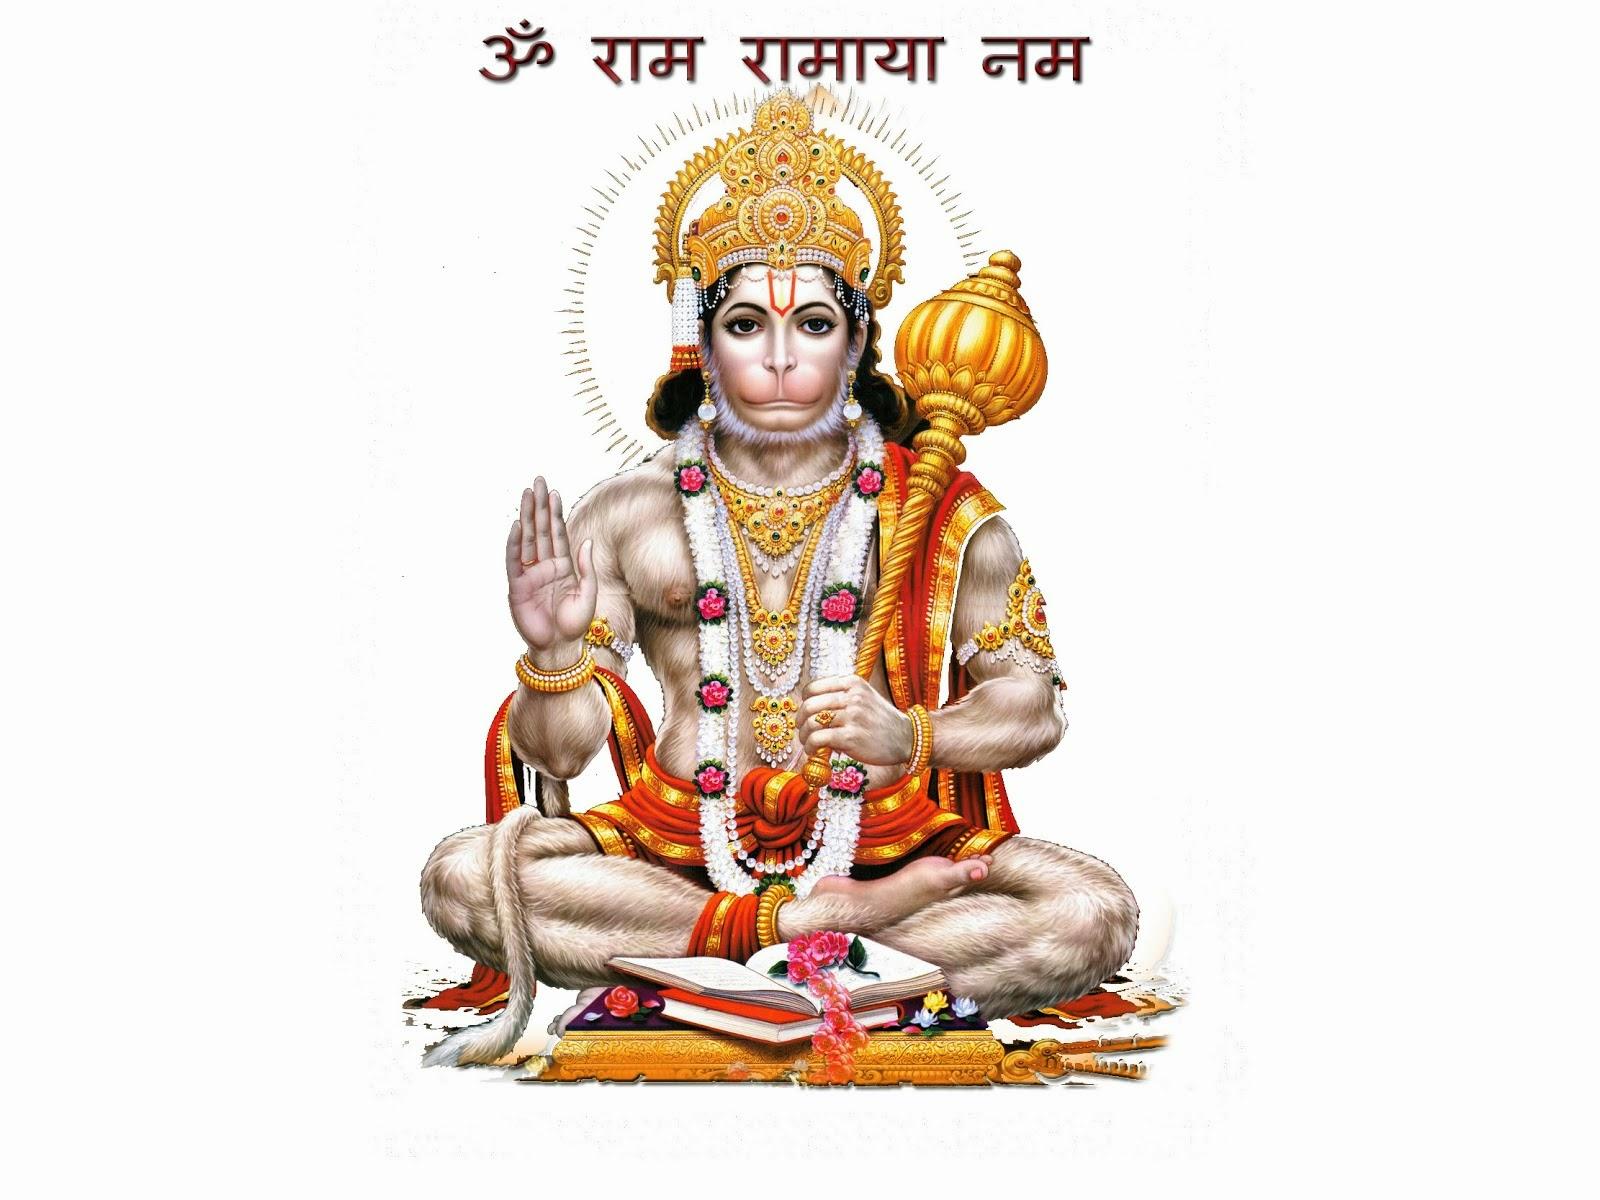 free hd wallpapers of download free hd wallpapers download hd wallpapers of events download hanuman ji hd images of hanumanji